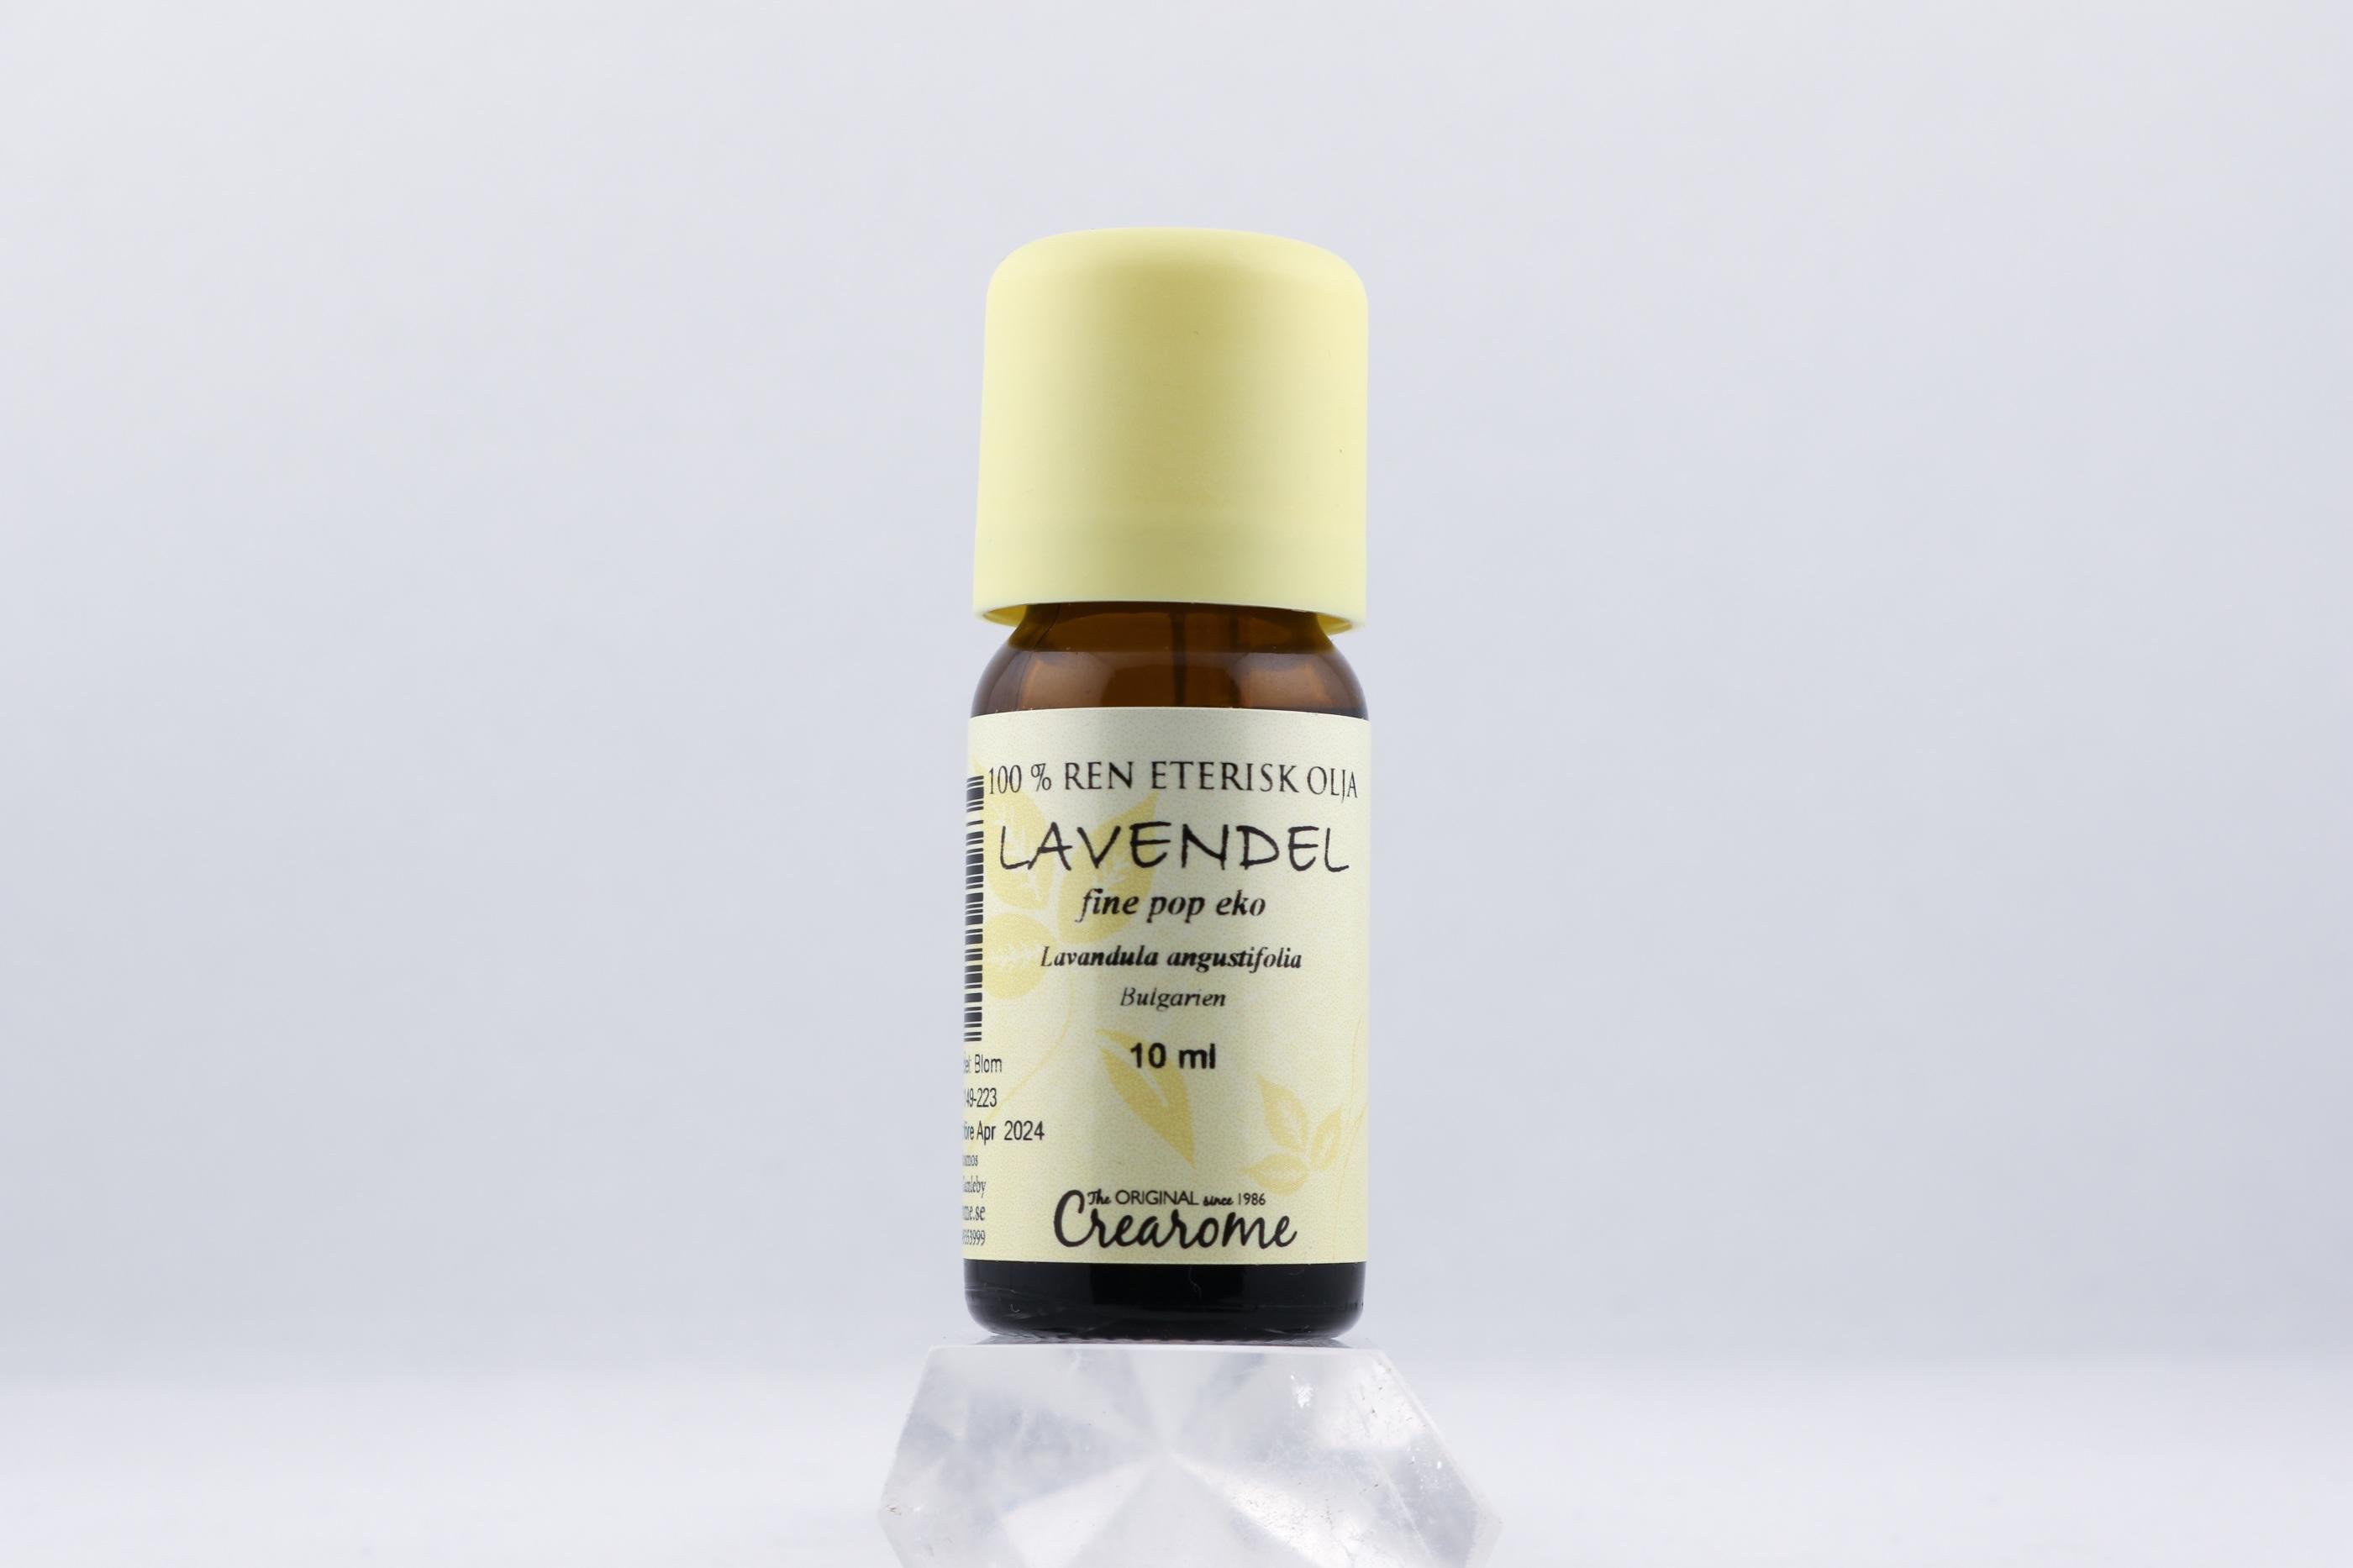 Lavendel olja wellness ayurveda halmstad sweden svensk eterisk aroma olja